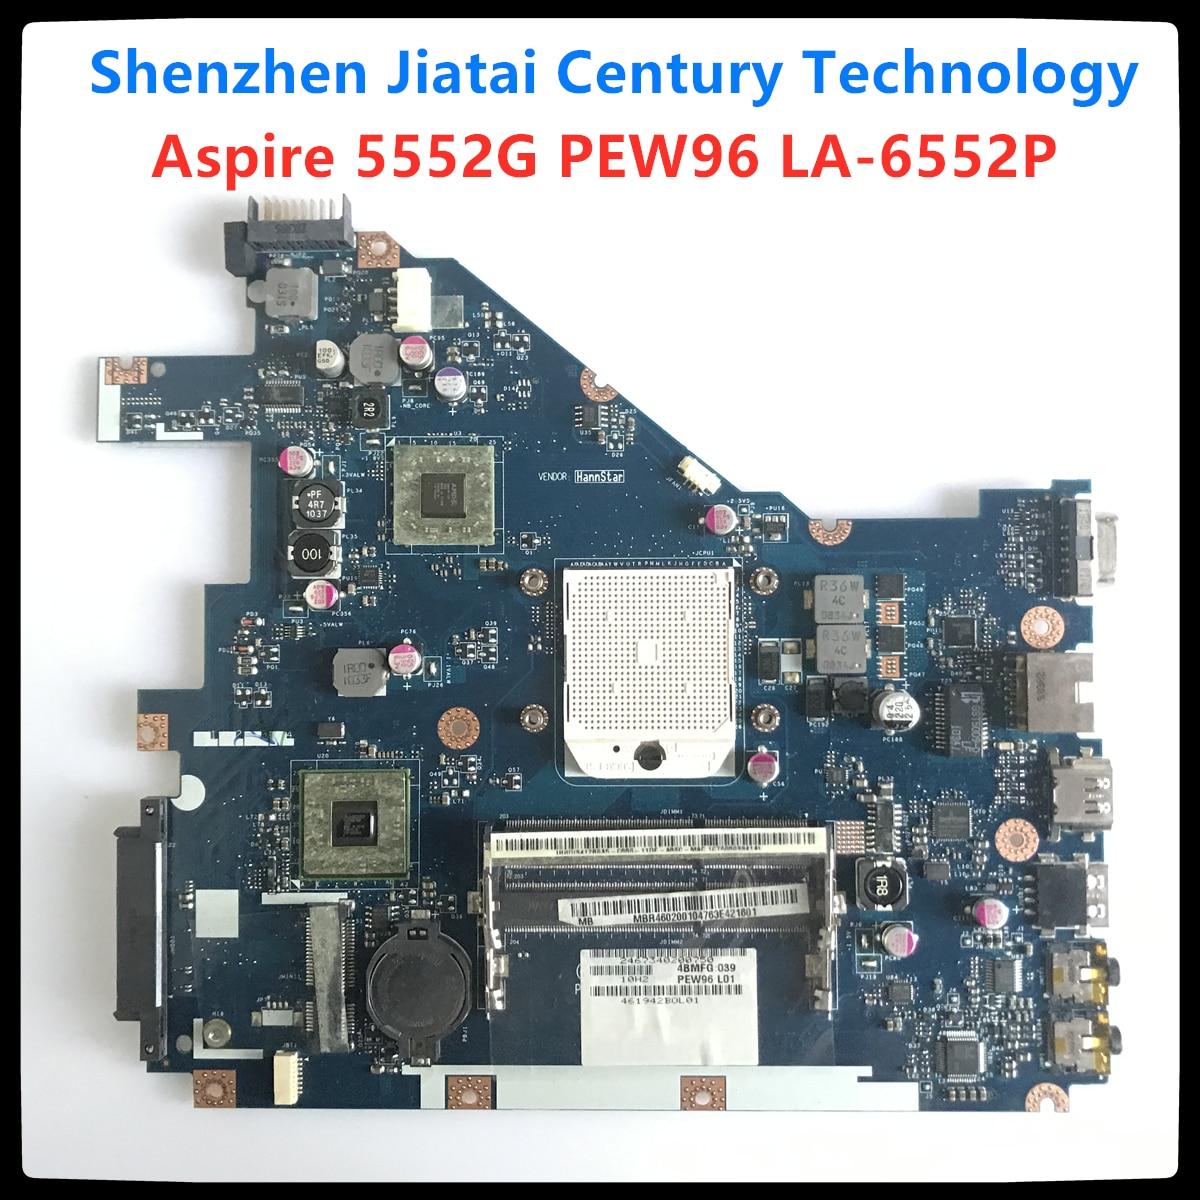 PEW96 LA-6552P NV50A Fit Voor Acer 5552 5552G Laptop Moederbord MBR4602001 Emachines E442 E642 Moederbord Volledig Getest Werken